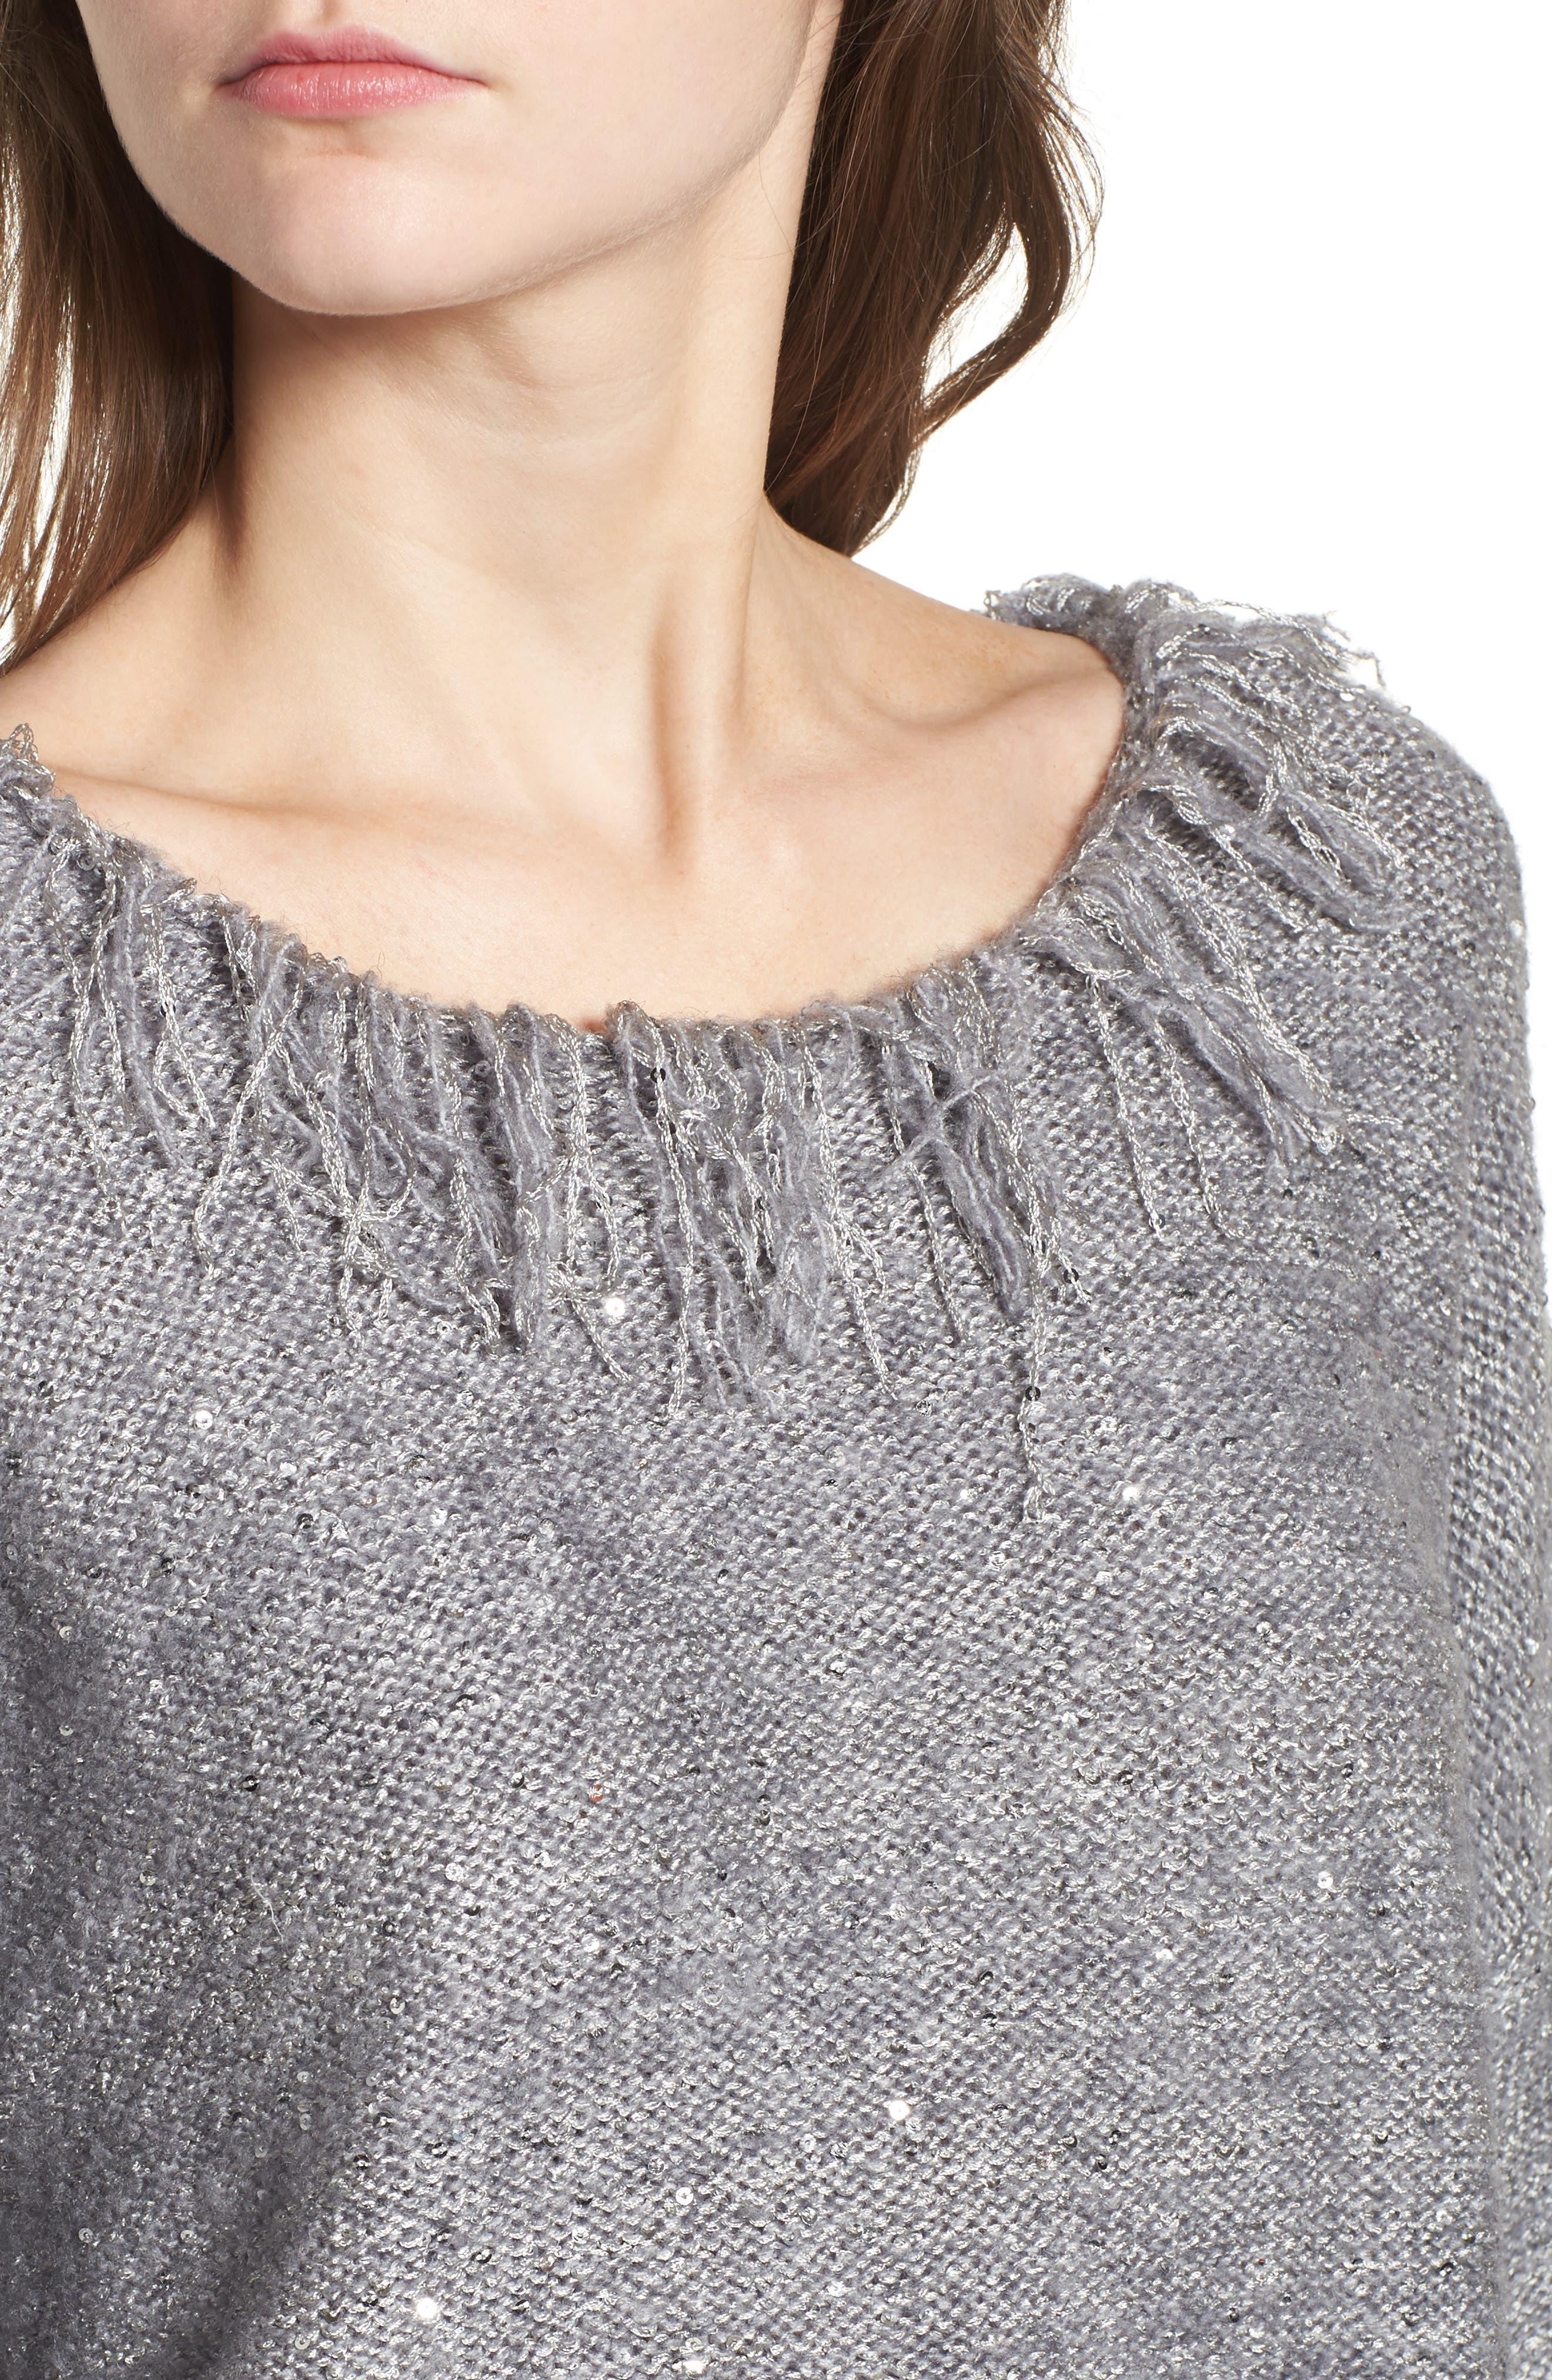 Savannah Frayed Sweater,                             Alternate thumbnail 4, color,                             020